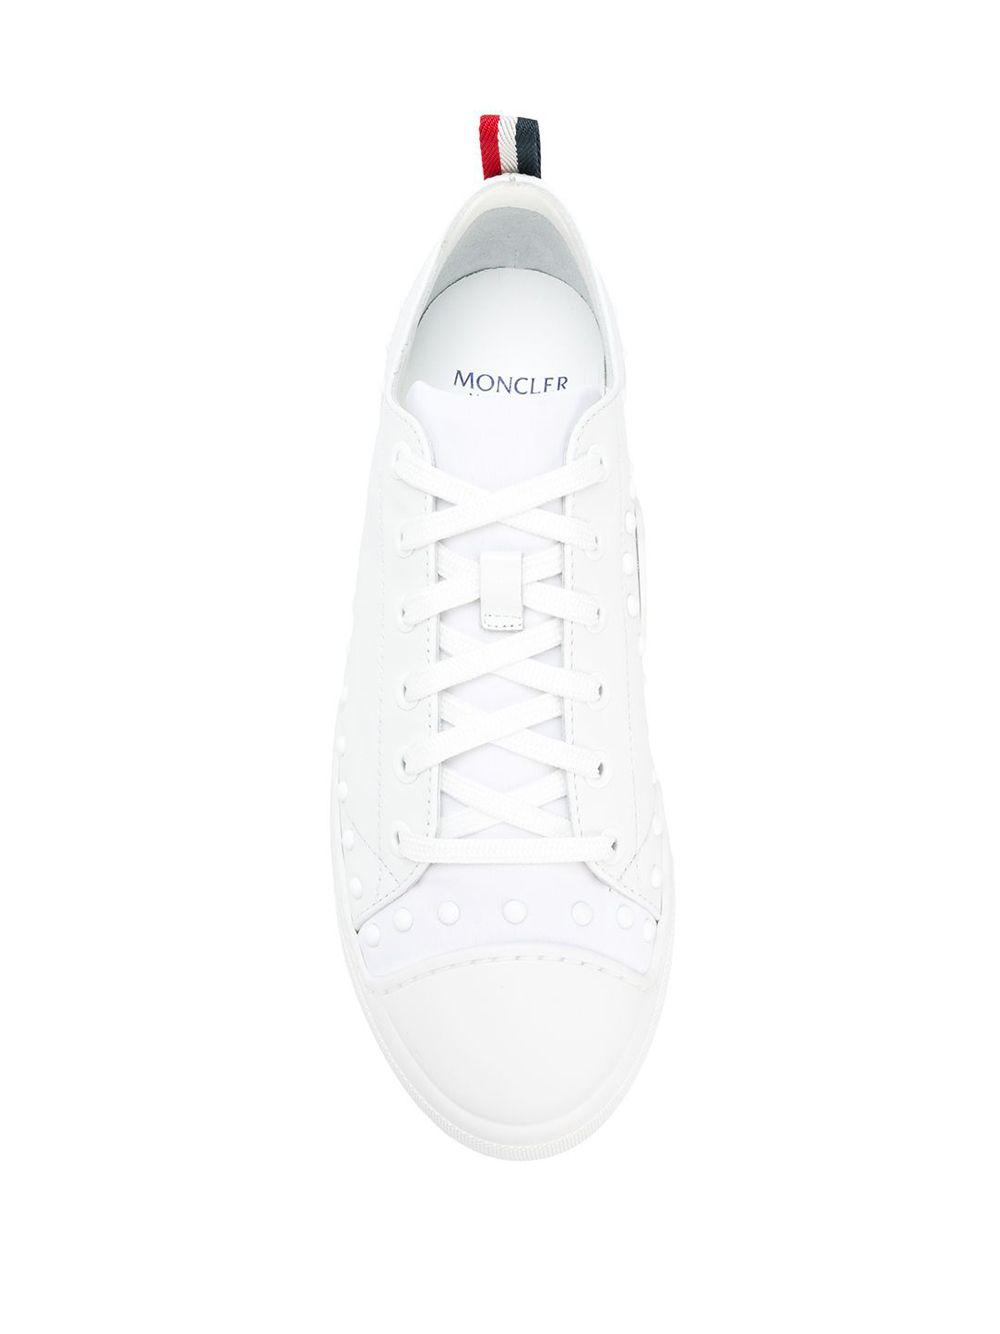 MONCLER | кроссовки 'Linda' | Clouty